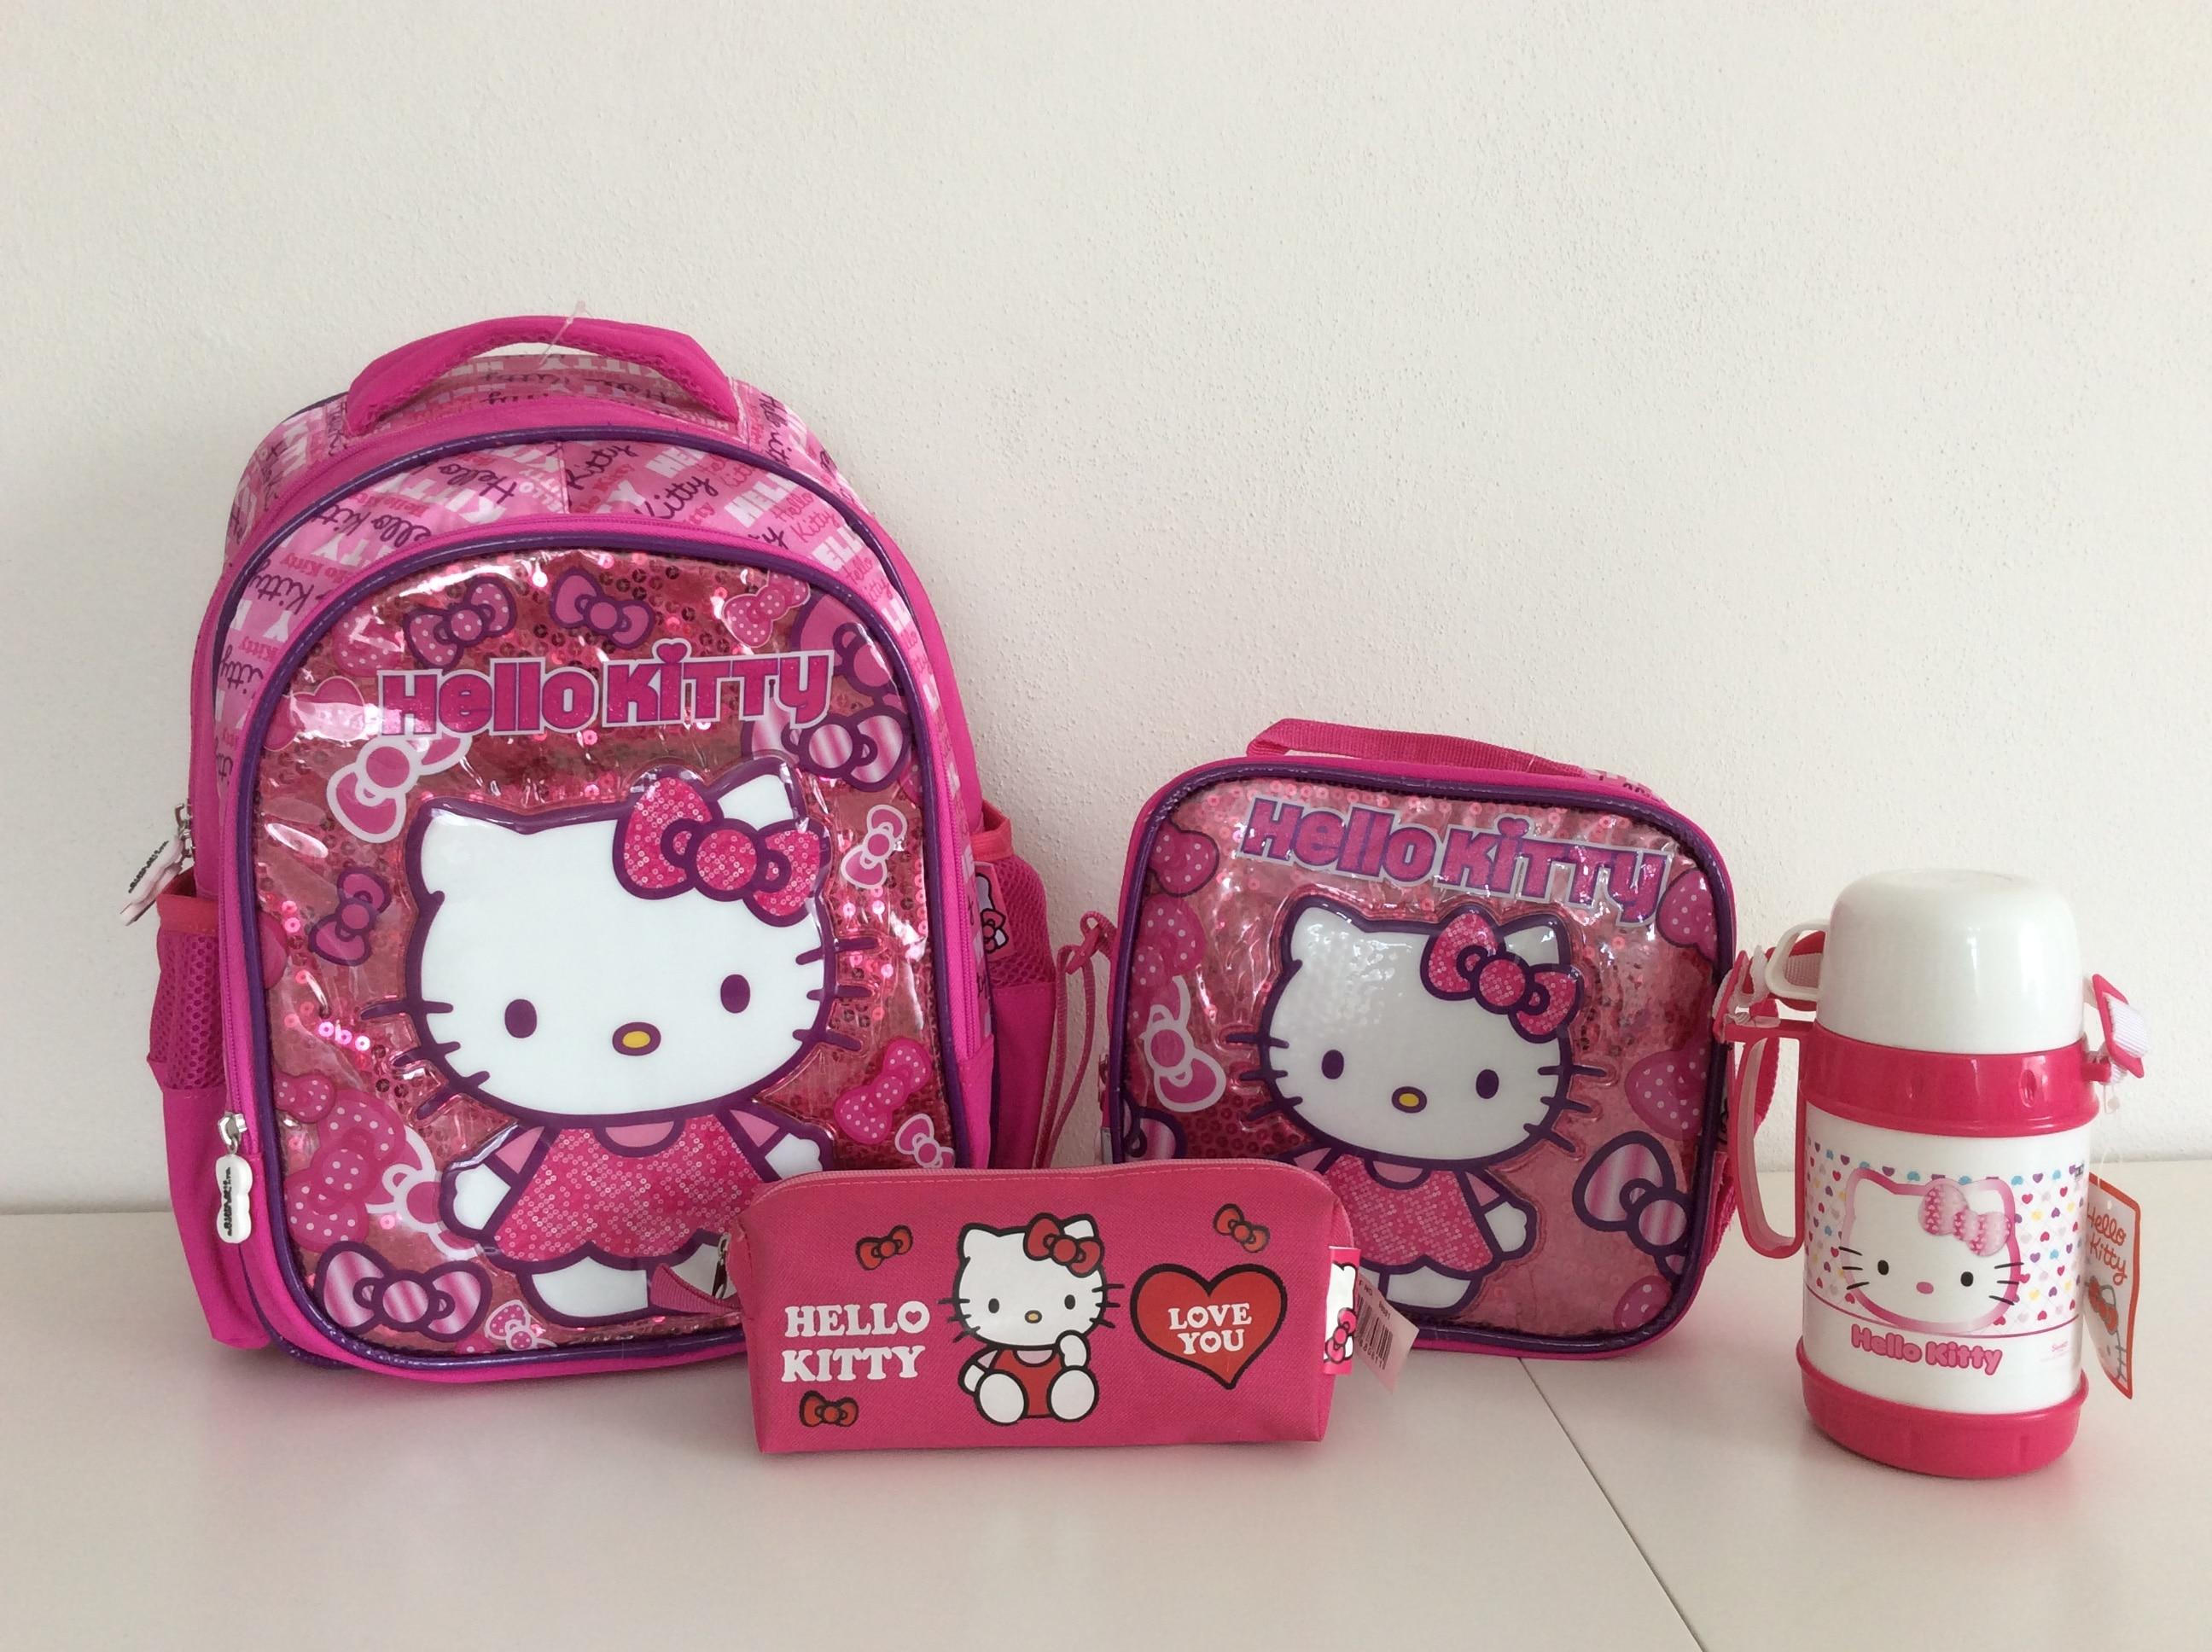 Download (2592x1936) · New Hello kitty Handbag with Shoulder Strap Bag  Purse yey ... 3288630c4c